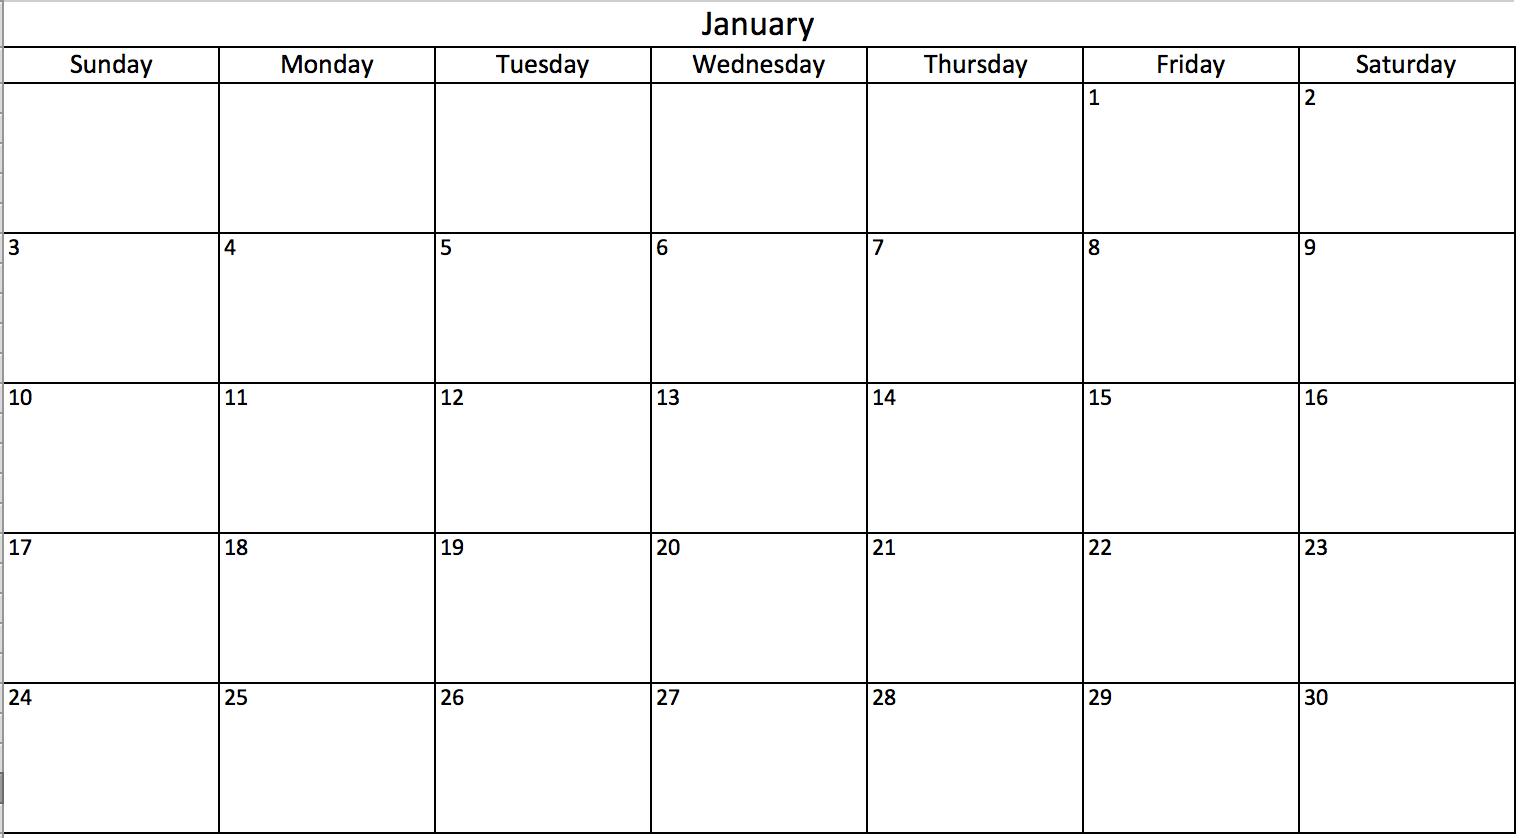 Hướng Dẫn Tạo Lịch 2021 Trong Excel Dễ Nhất - Download.vn pertaining to Fill In Calendar Printable 2021